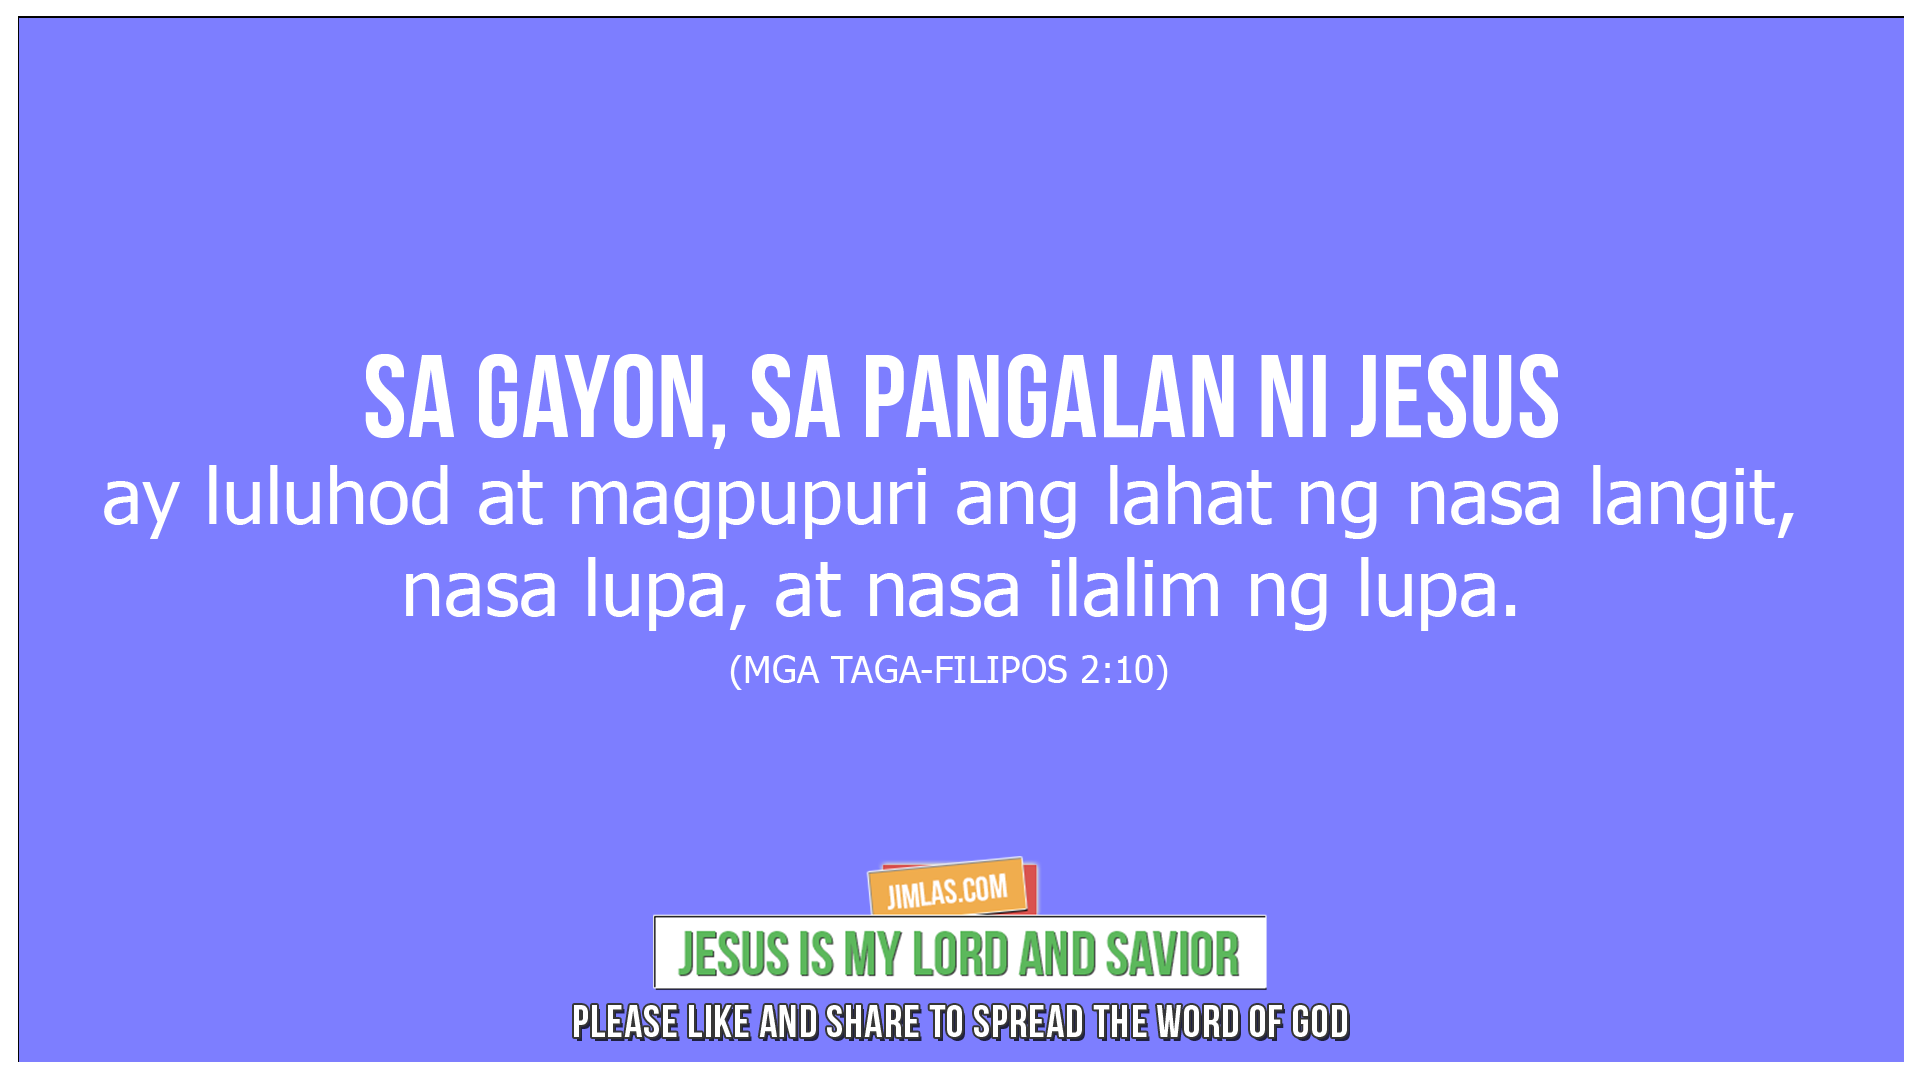 mga taga filipos 2 10, Mga Taga Filipos 2:10